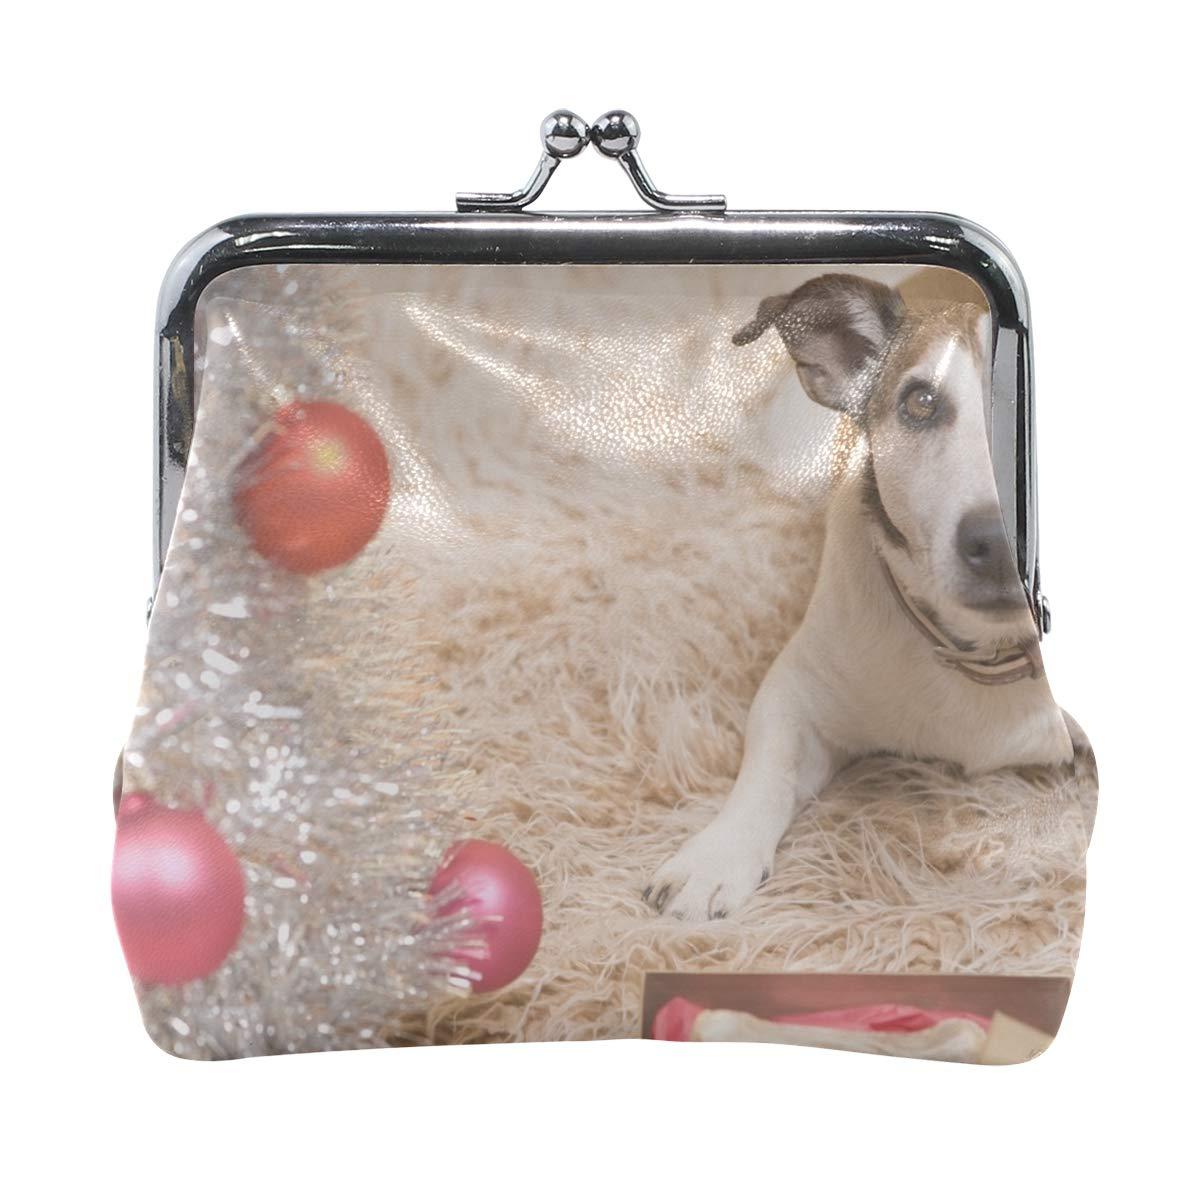 Rh Studio Coin Purse Clasp Closure Dog Carpet New Year Print Wallet Exquisite Coin Pouch Girls Women Clutch Handbag Exquisite Gift